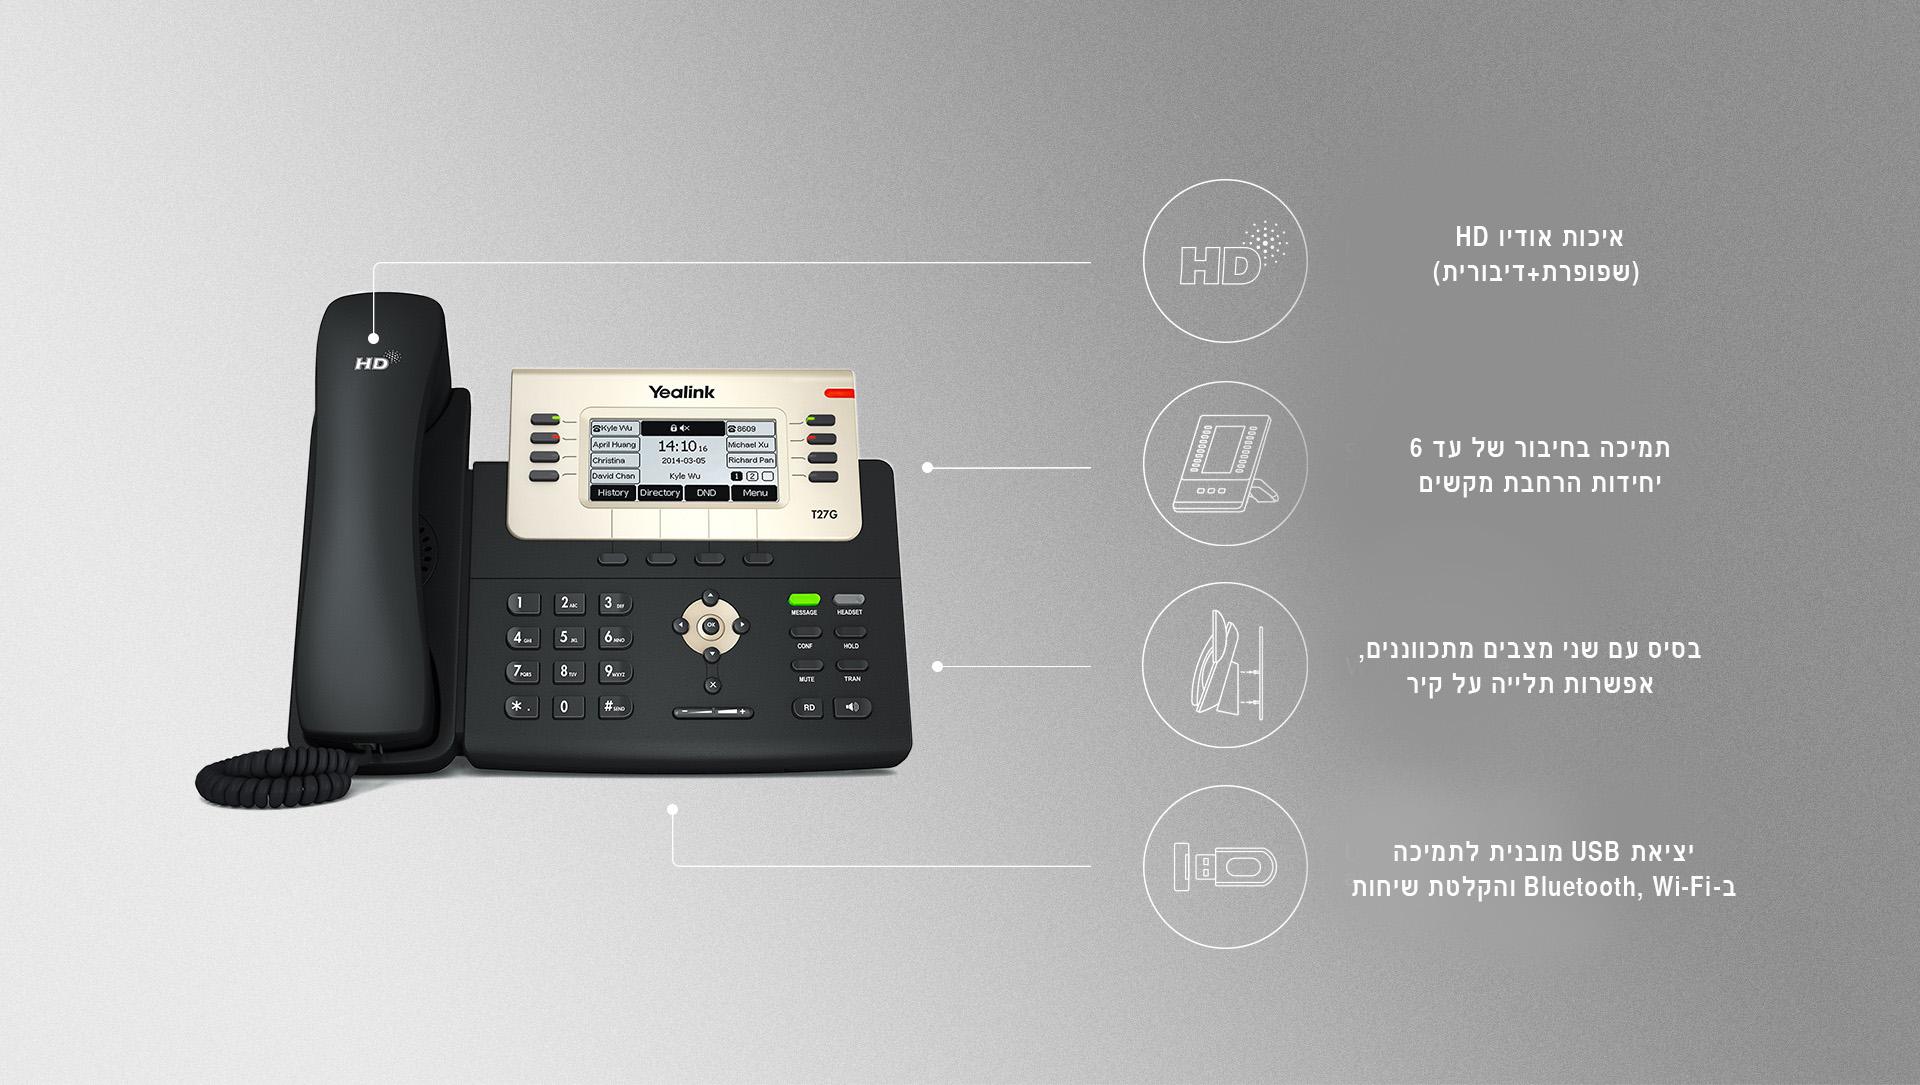 T27G טלפון IP SIP VOIP יאלינק